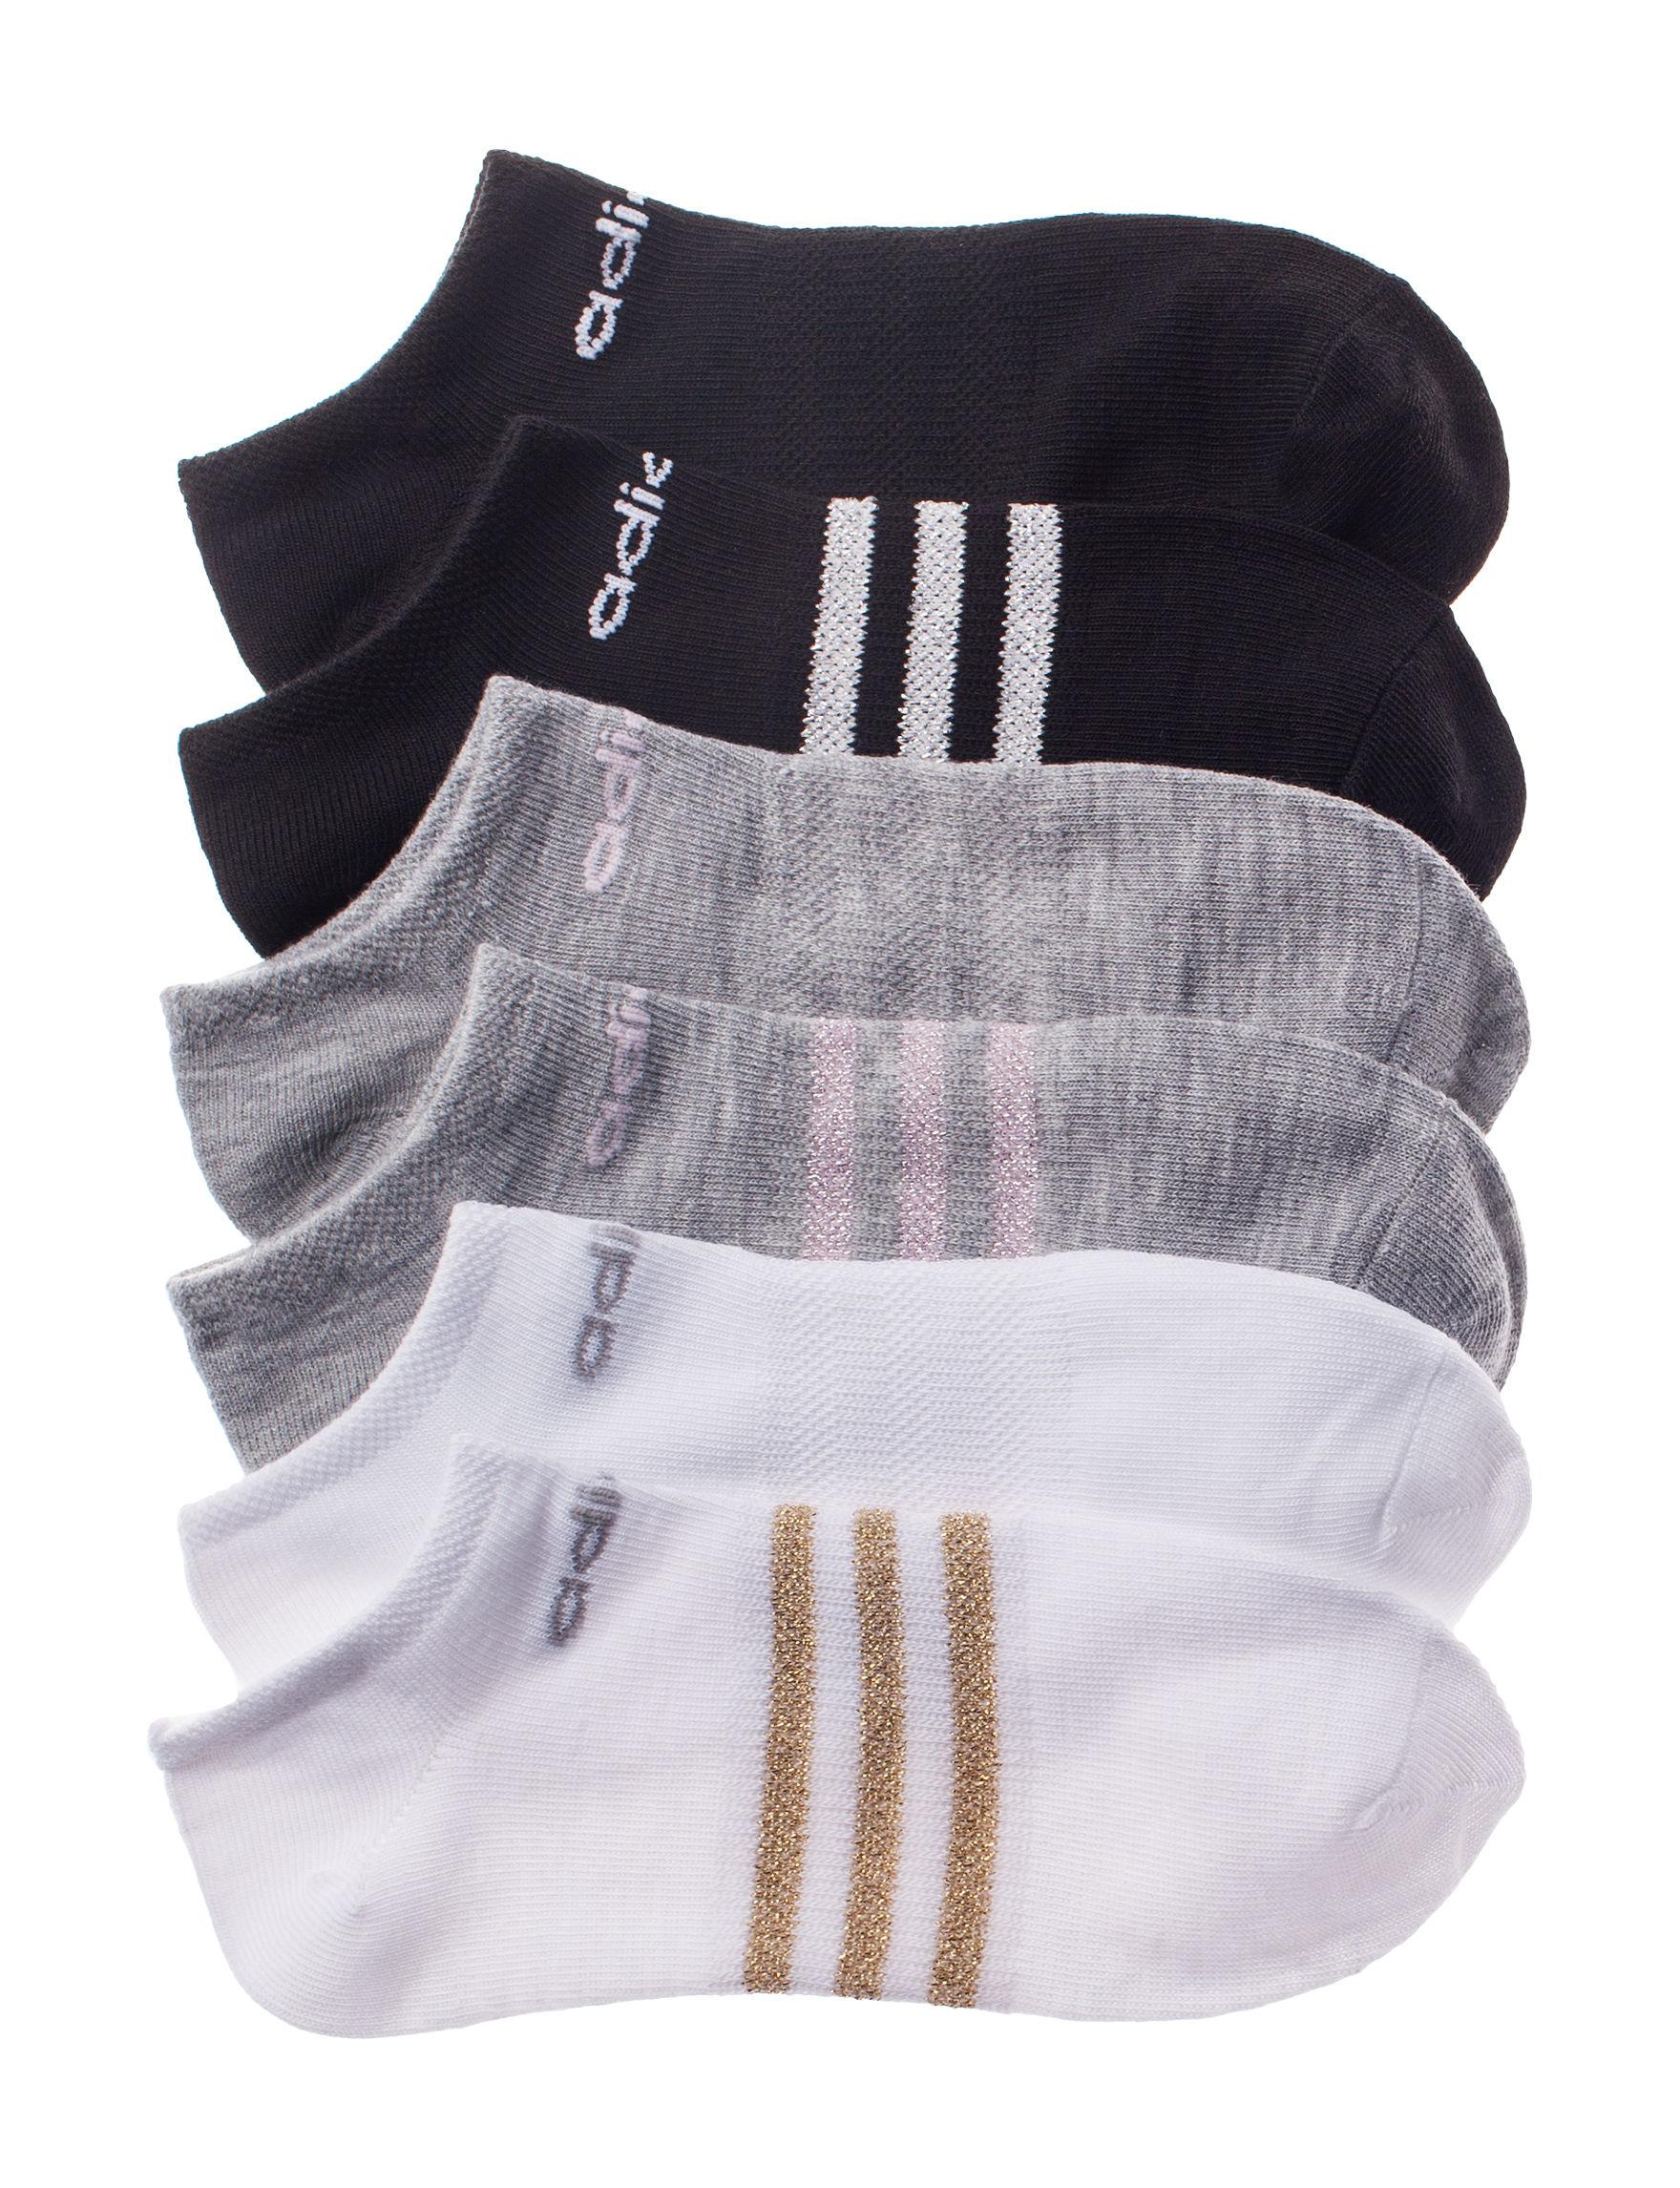 Adidas Grey / Black / White Socks